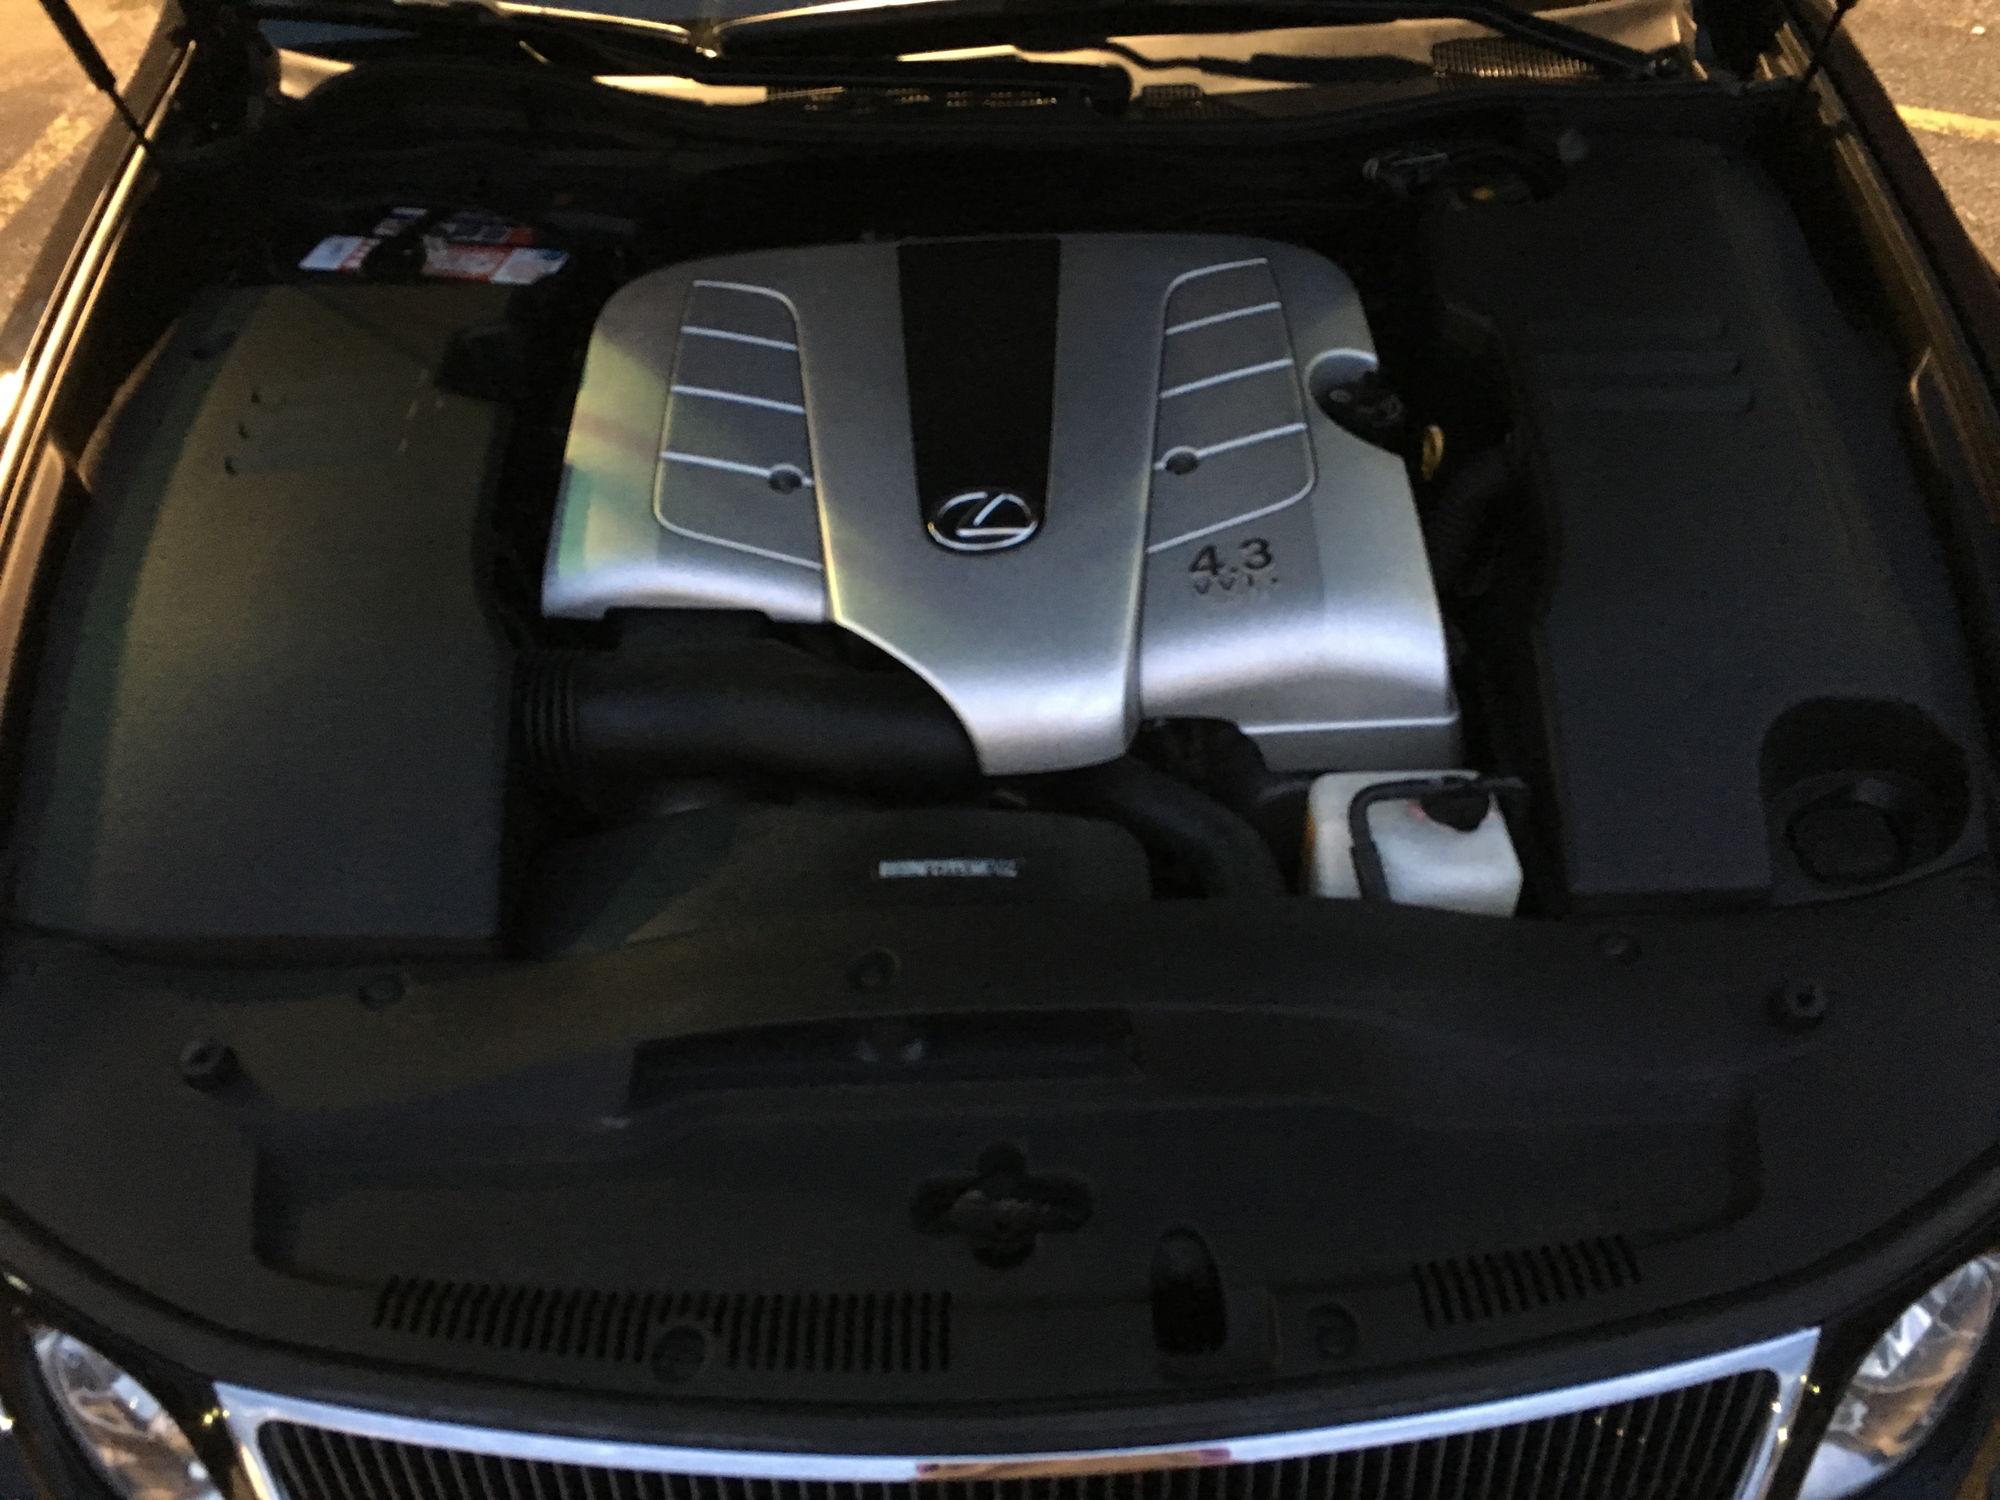 NY 2006 Lexus gs430 Loaded black on black! - ClubLexus - Lexus Forum ...